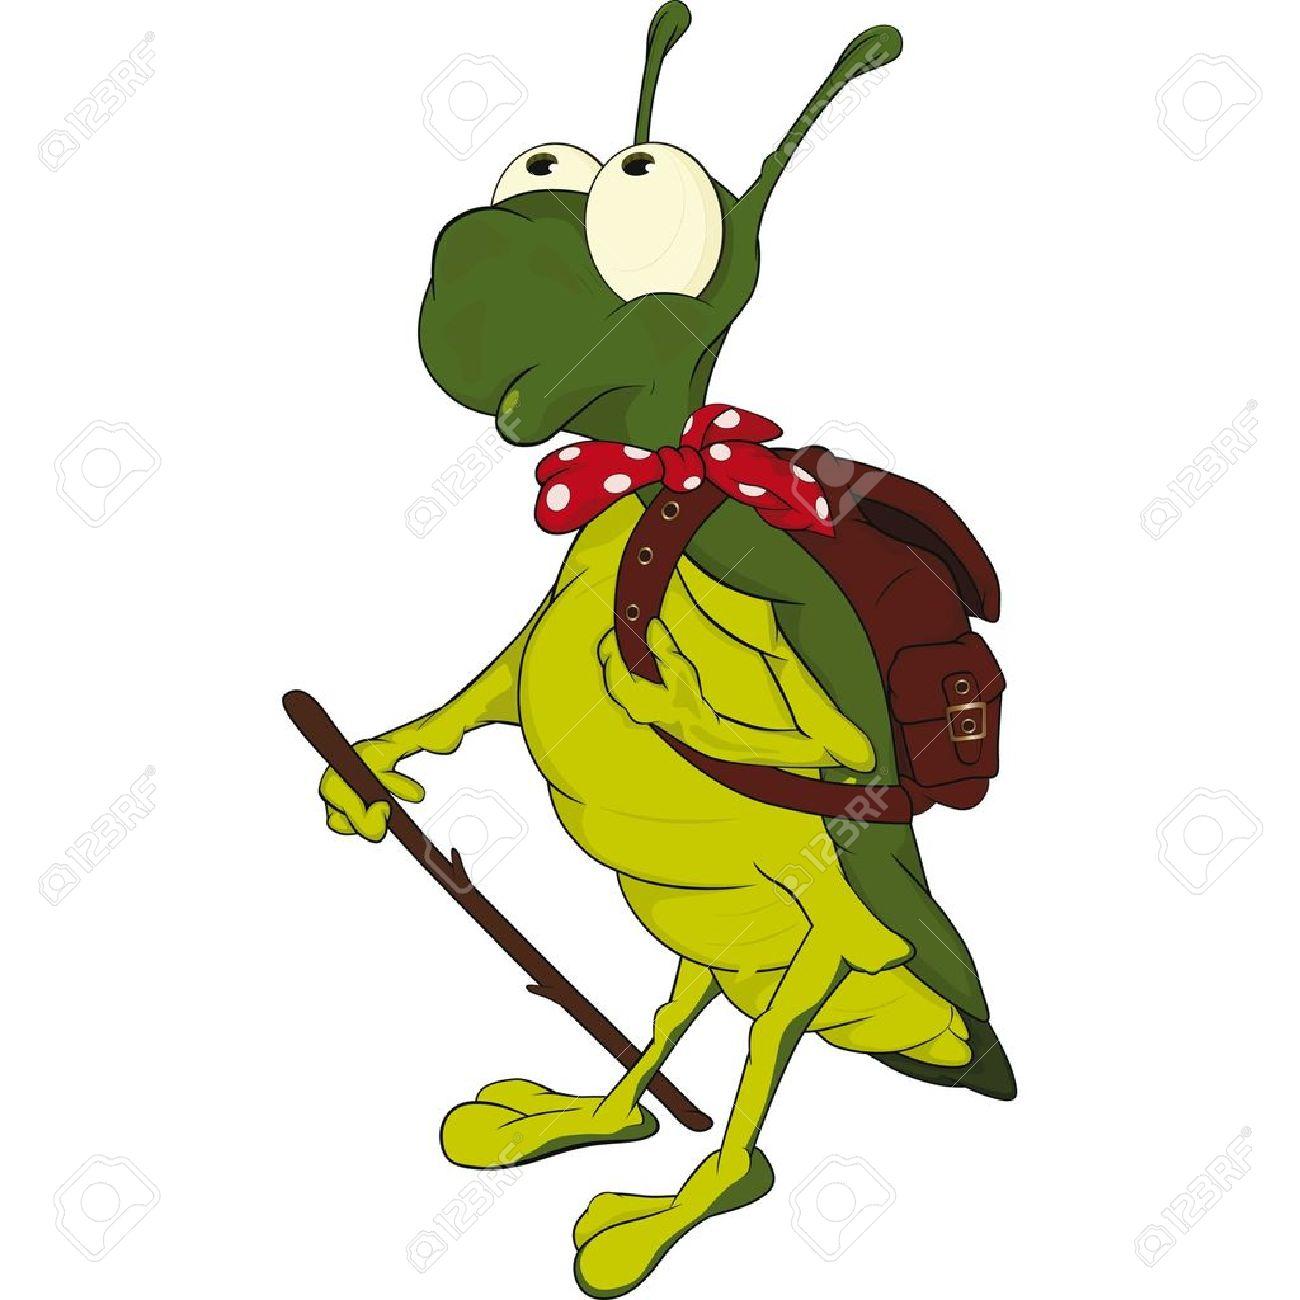 Cricket clipart singing #5